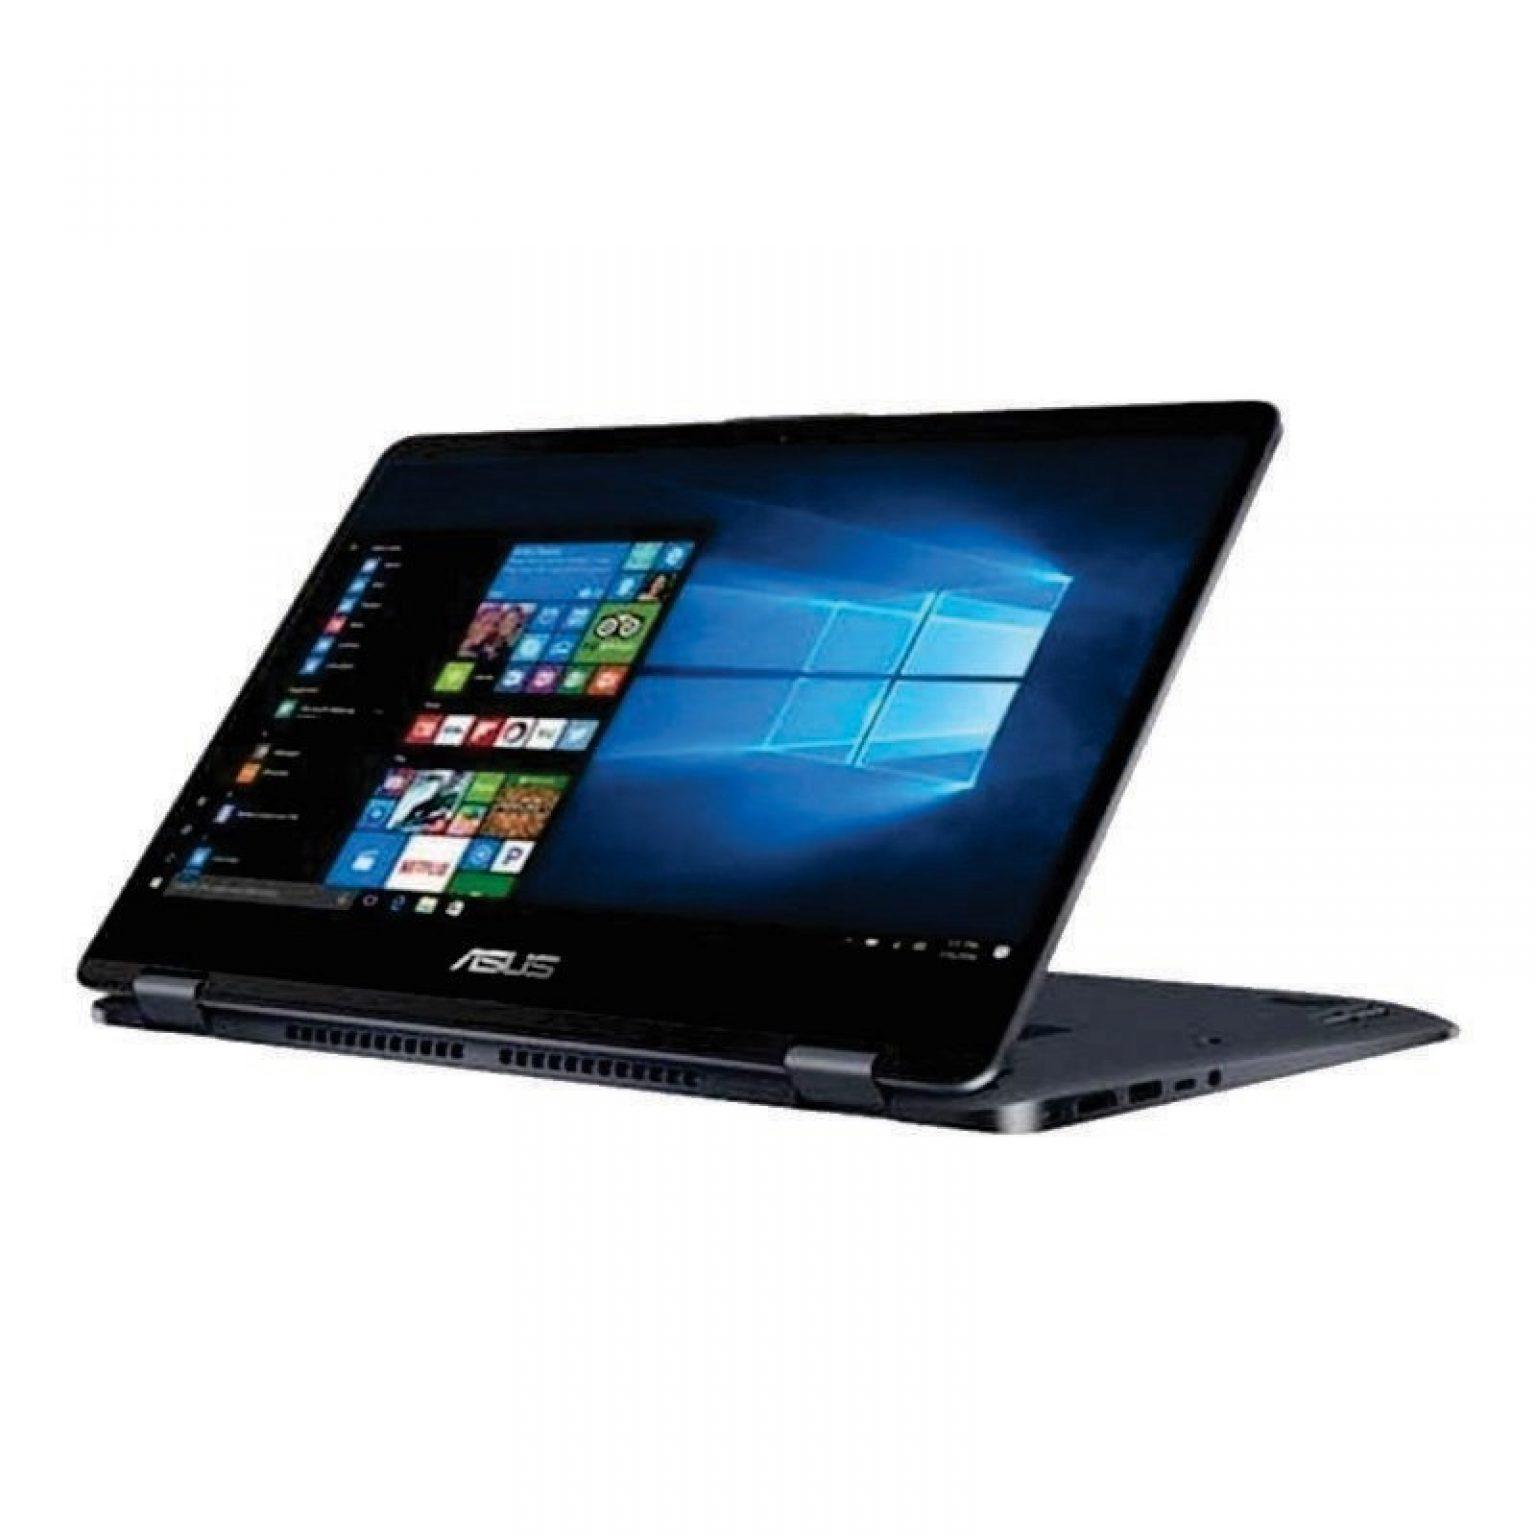 ASUS - VivoBook Flip TP203NAH-BP011T (N3350/4GB RAM/1TB HDD/Win10SL/Star Grey)